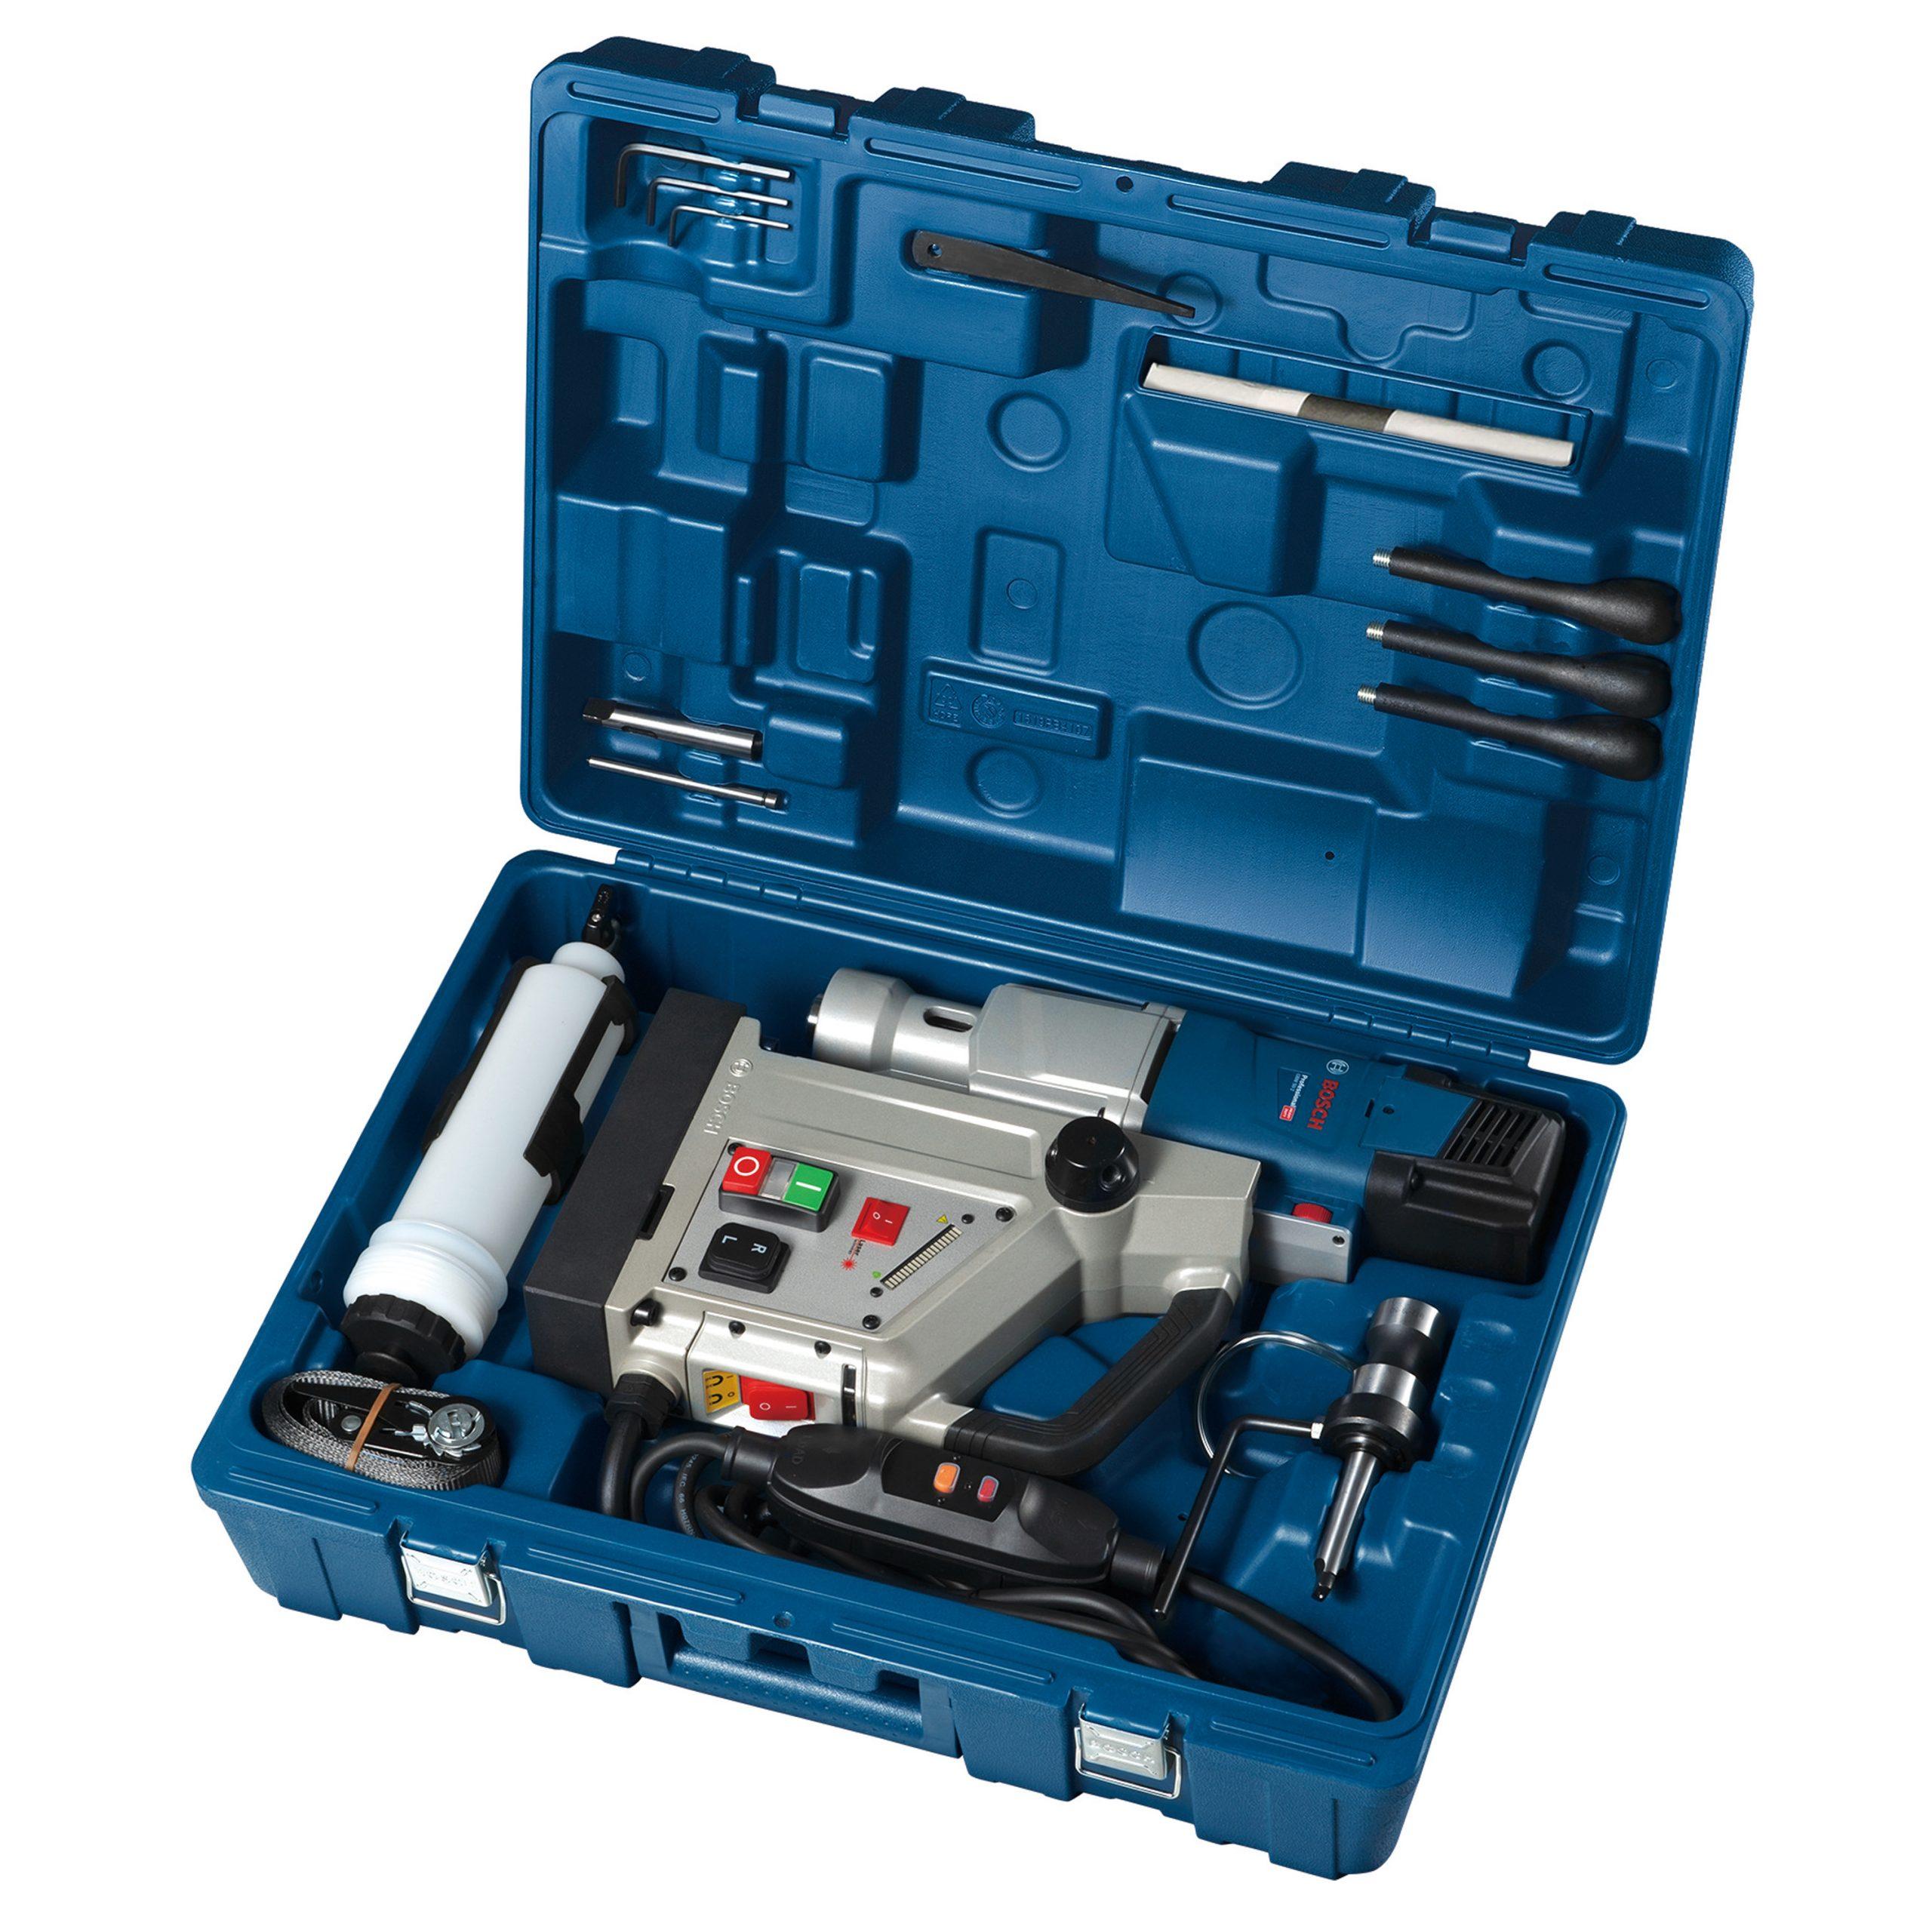 Bosch Magnetic Drill GBM 50-2